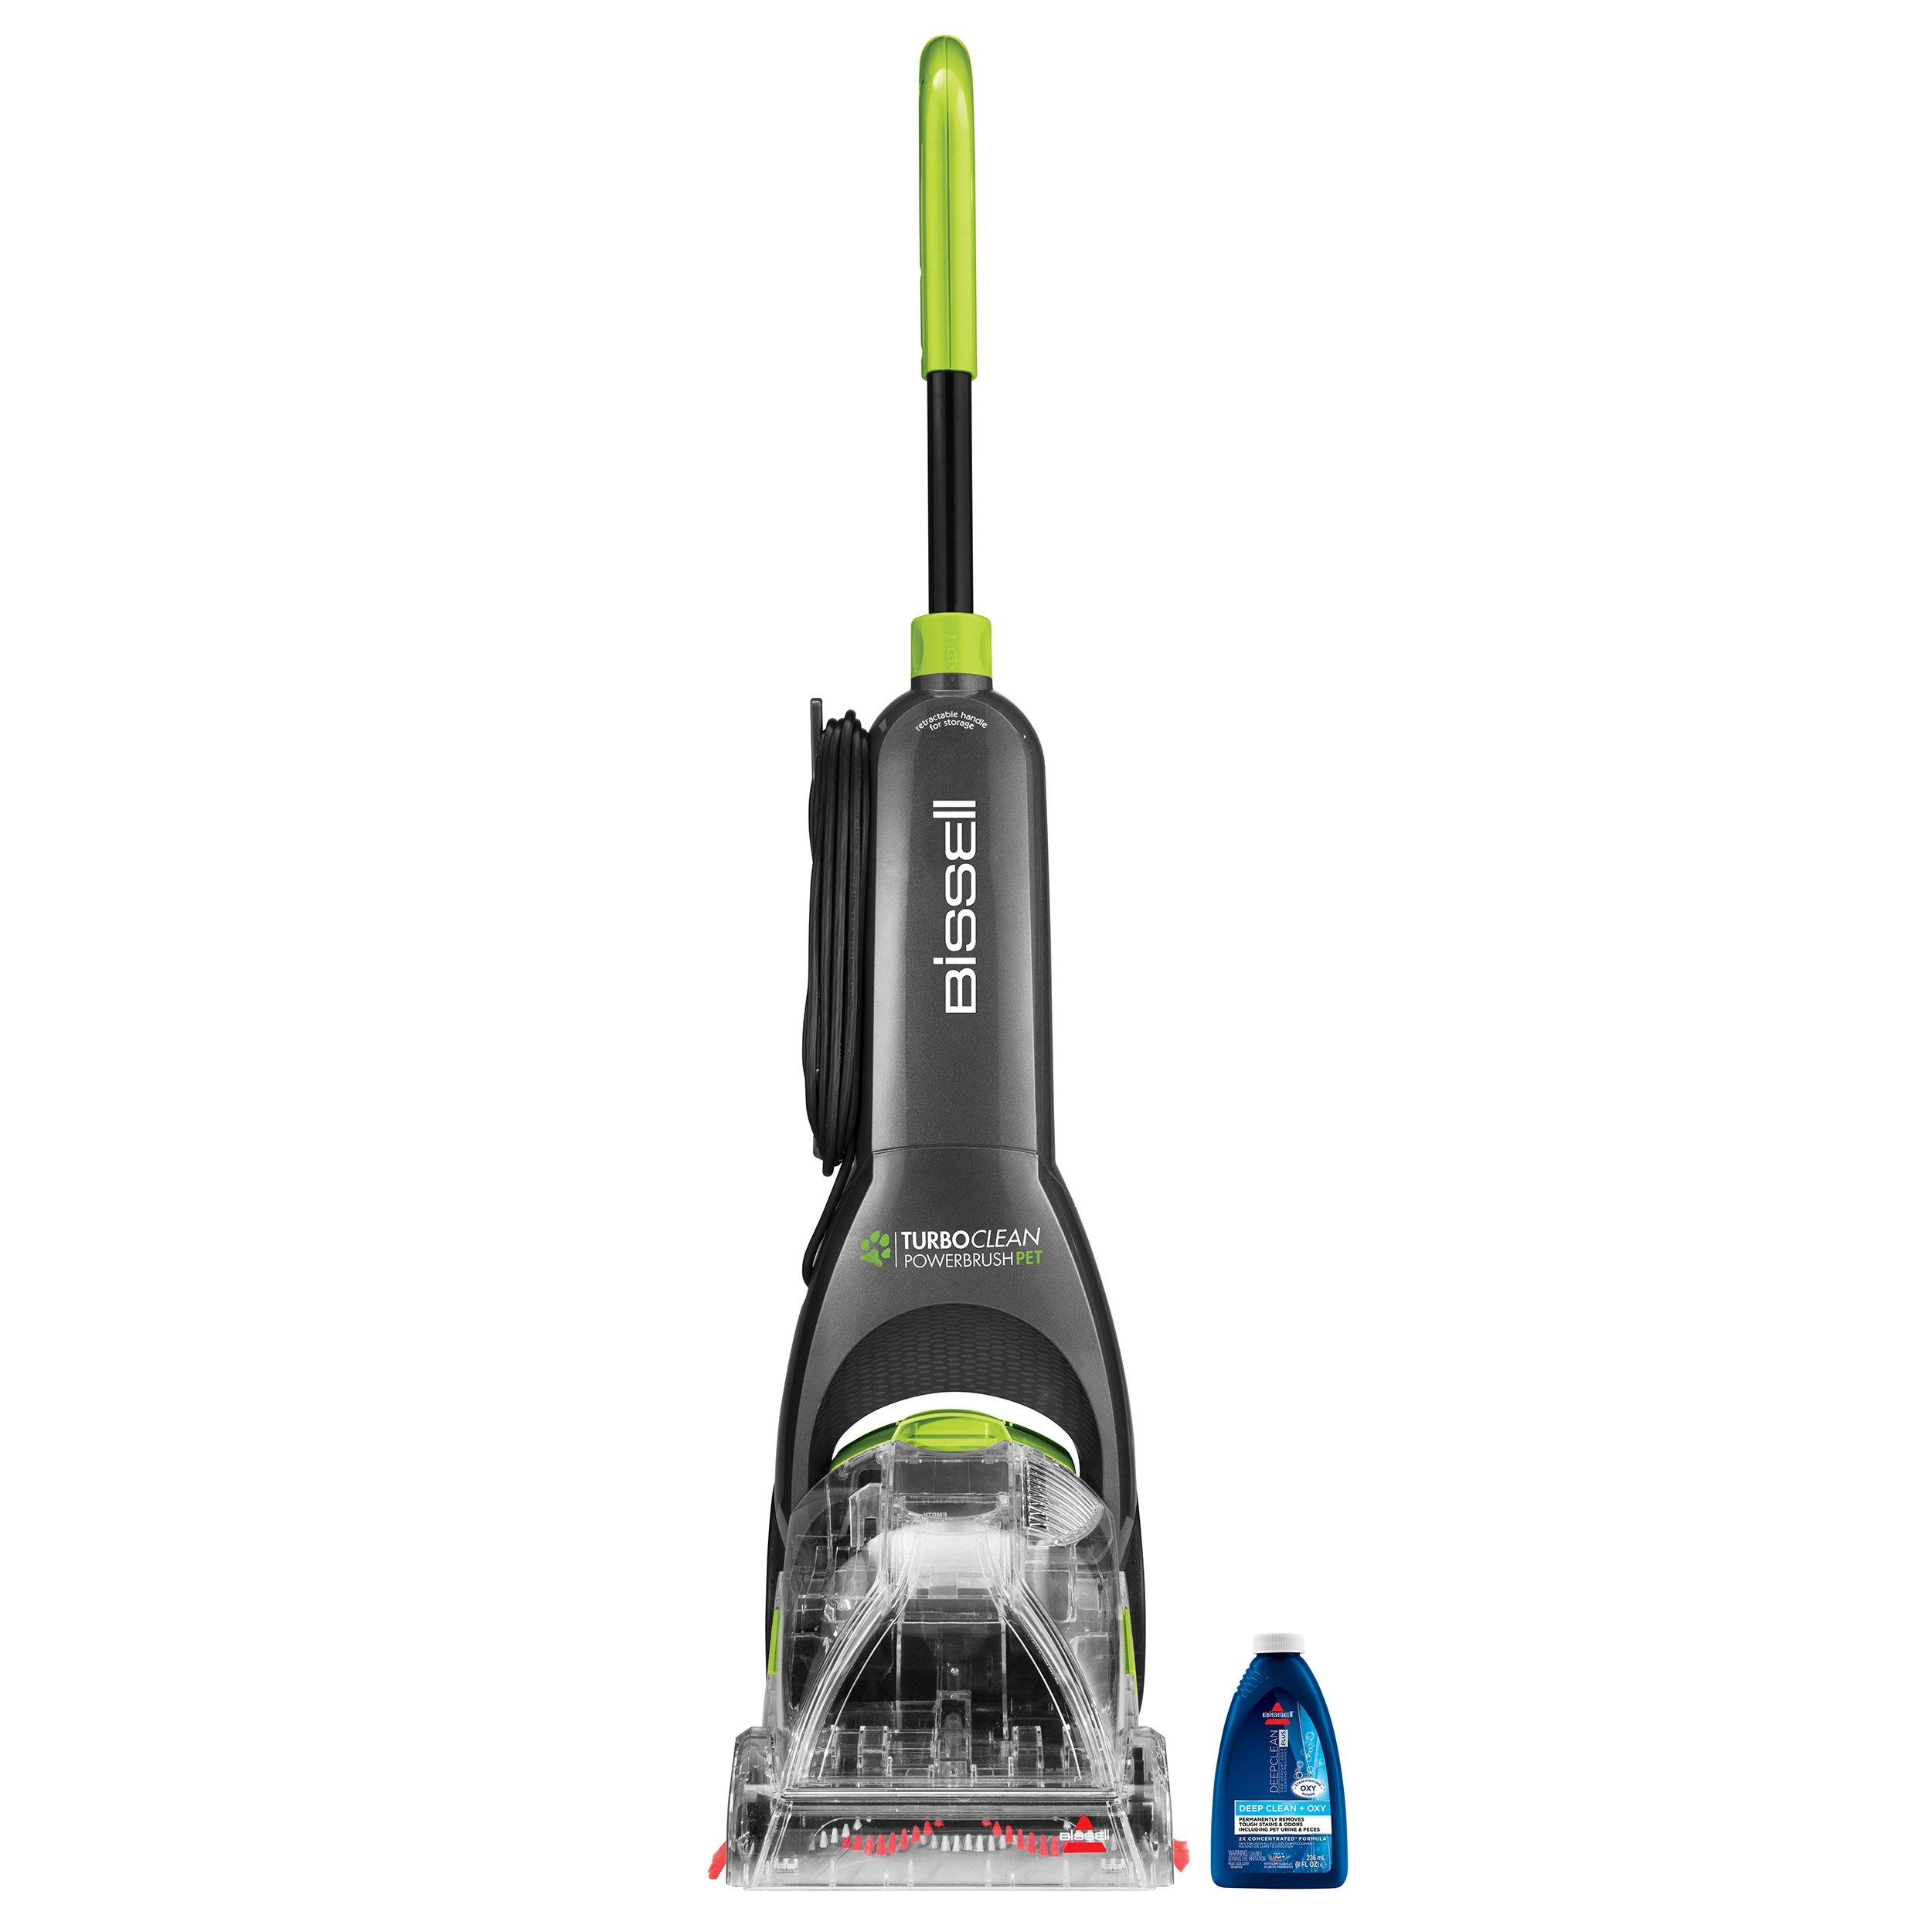 BISSELL Turboclean Powerbrush Shampooer 2085